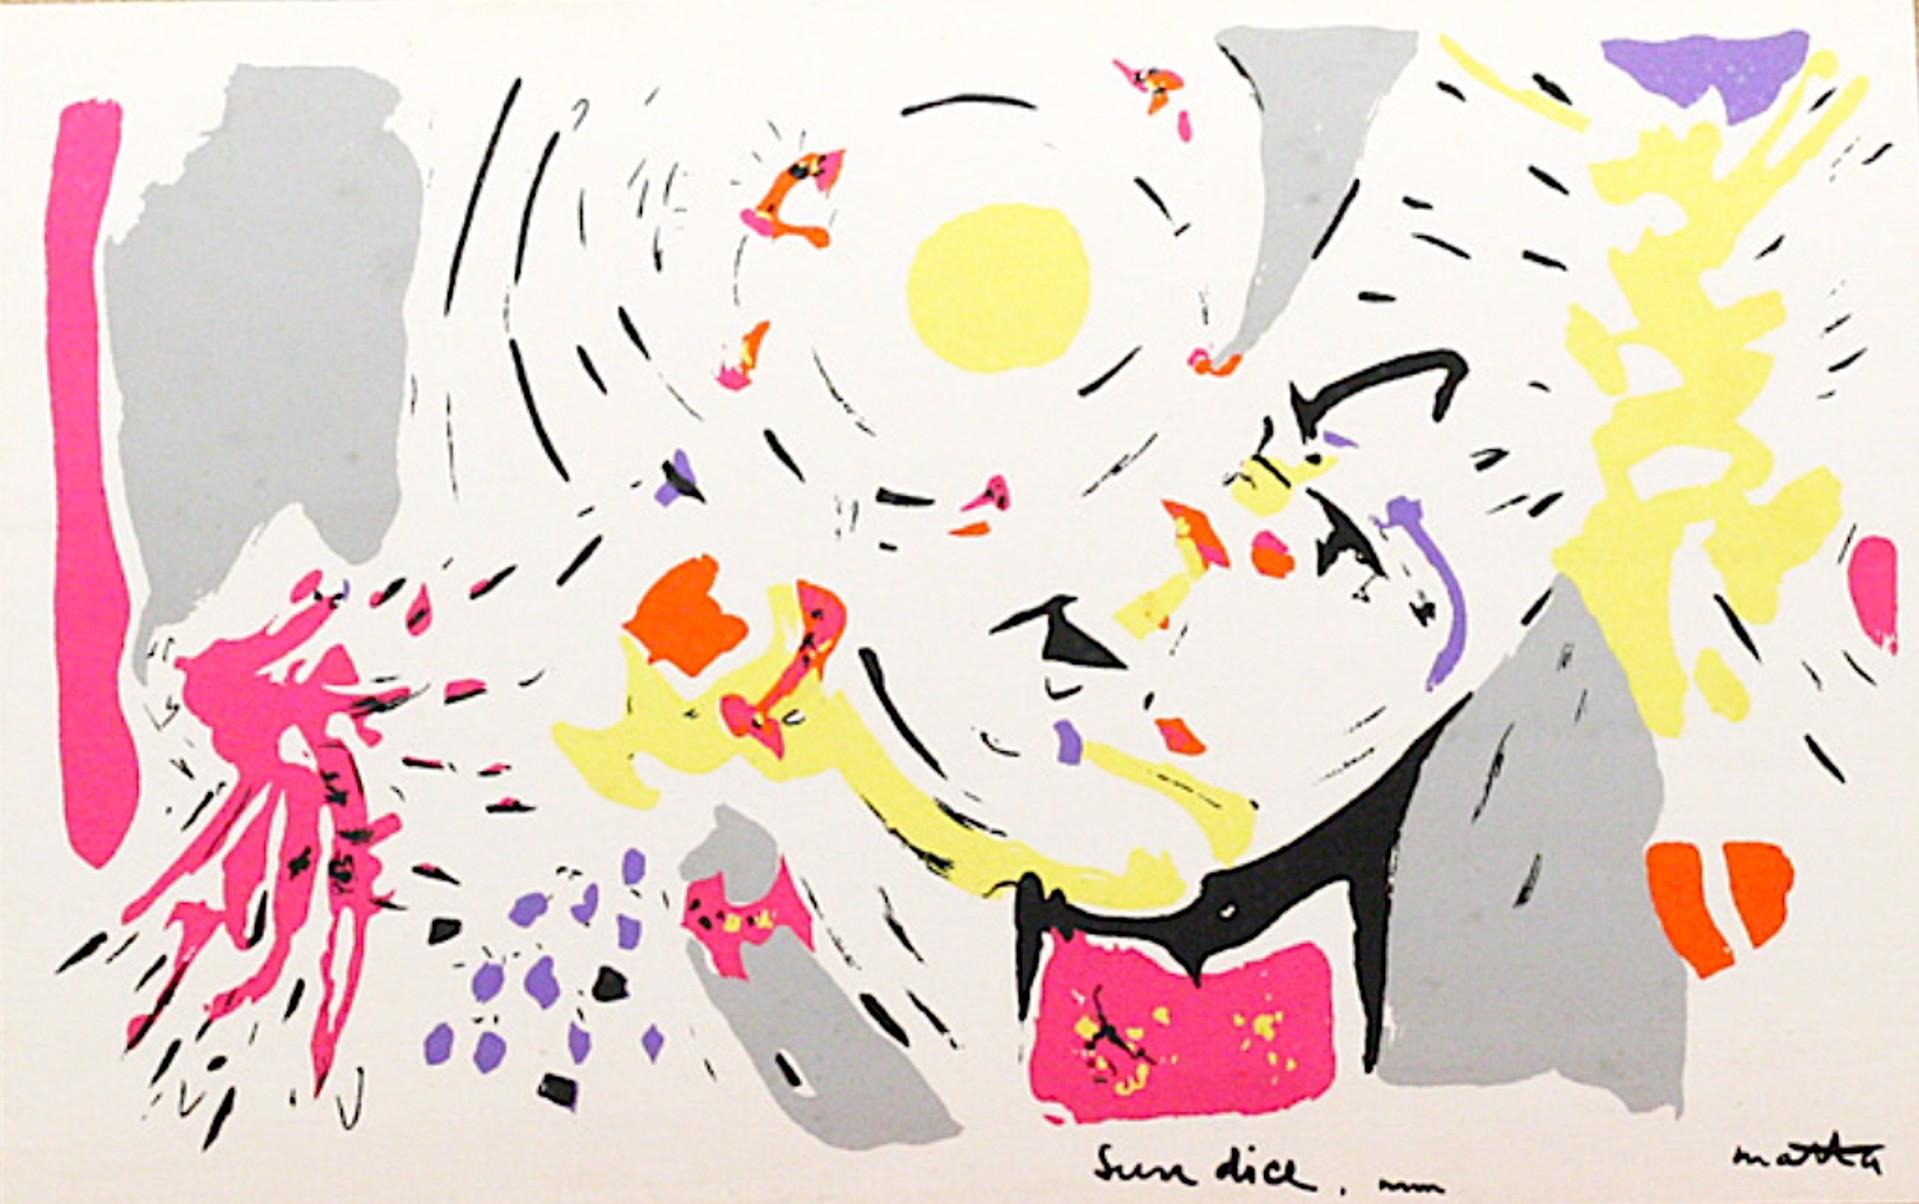 Sun Dice by Roberto Matta